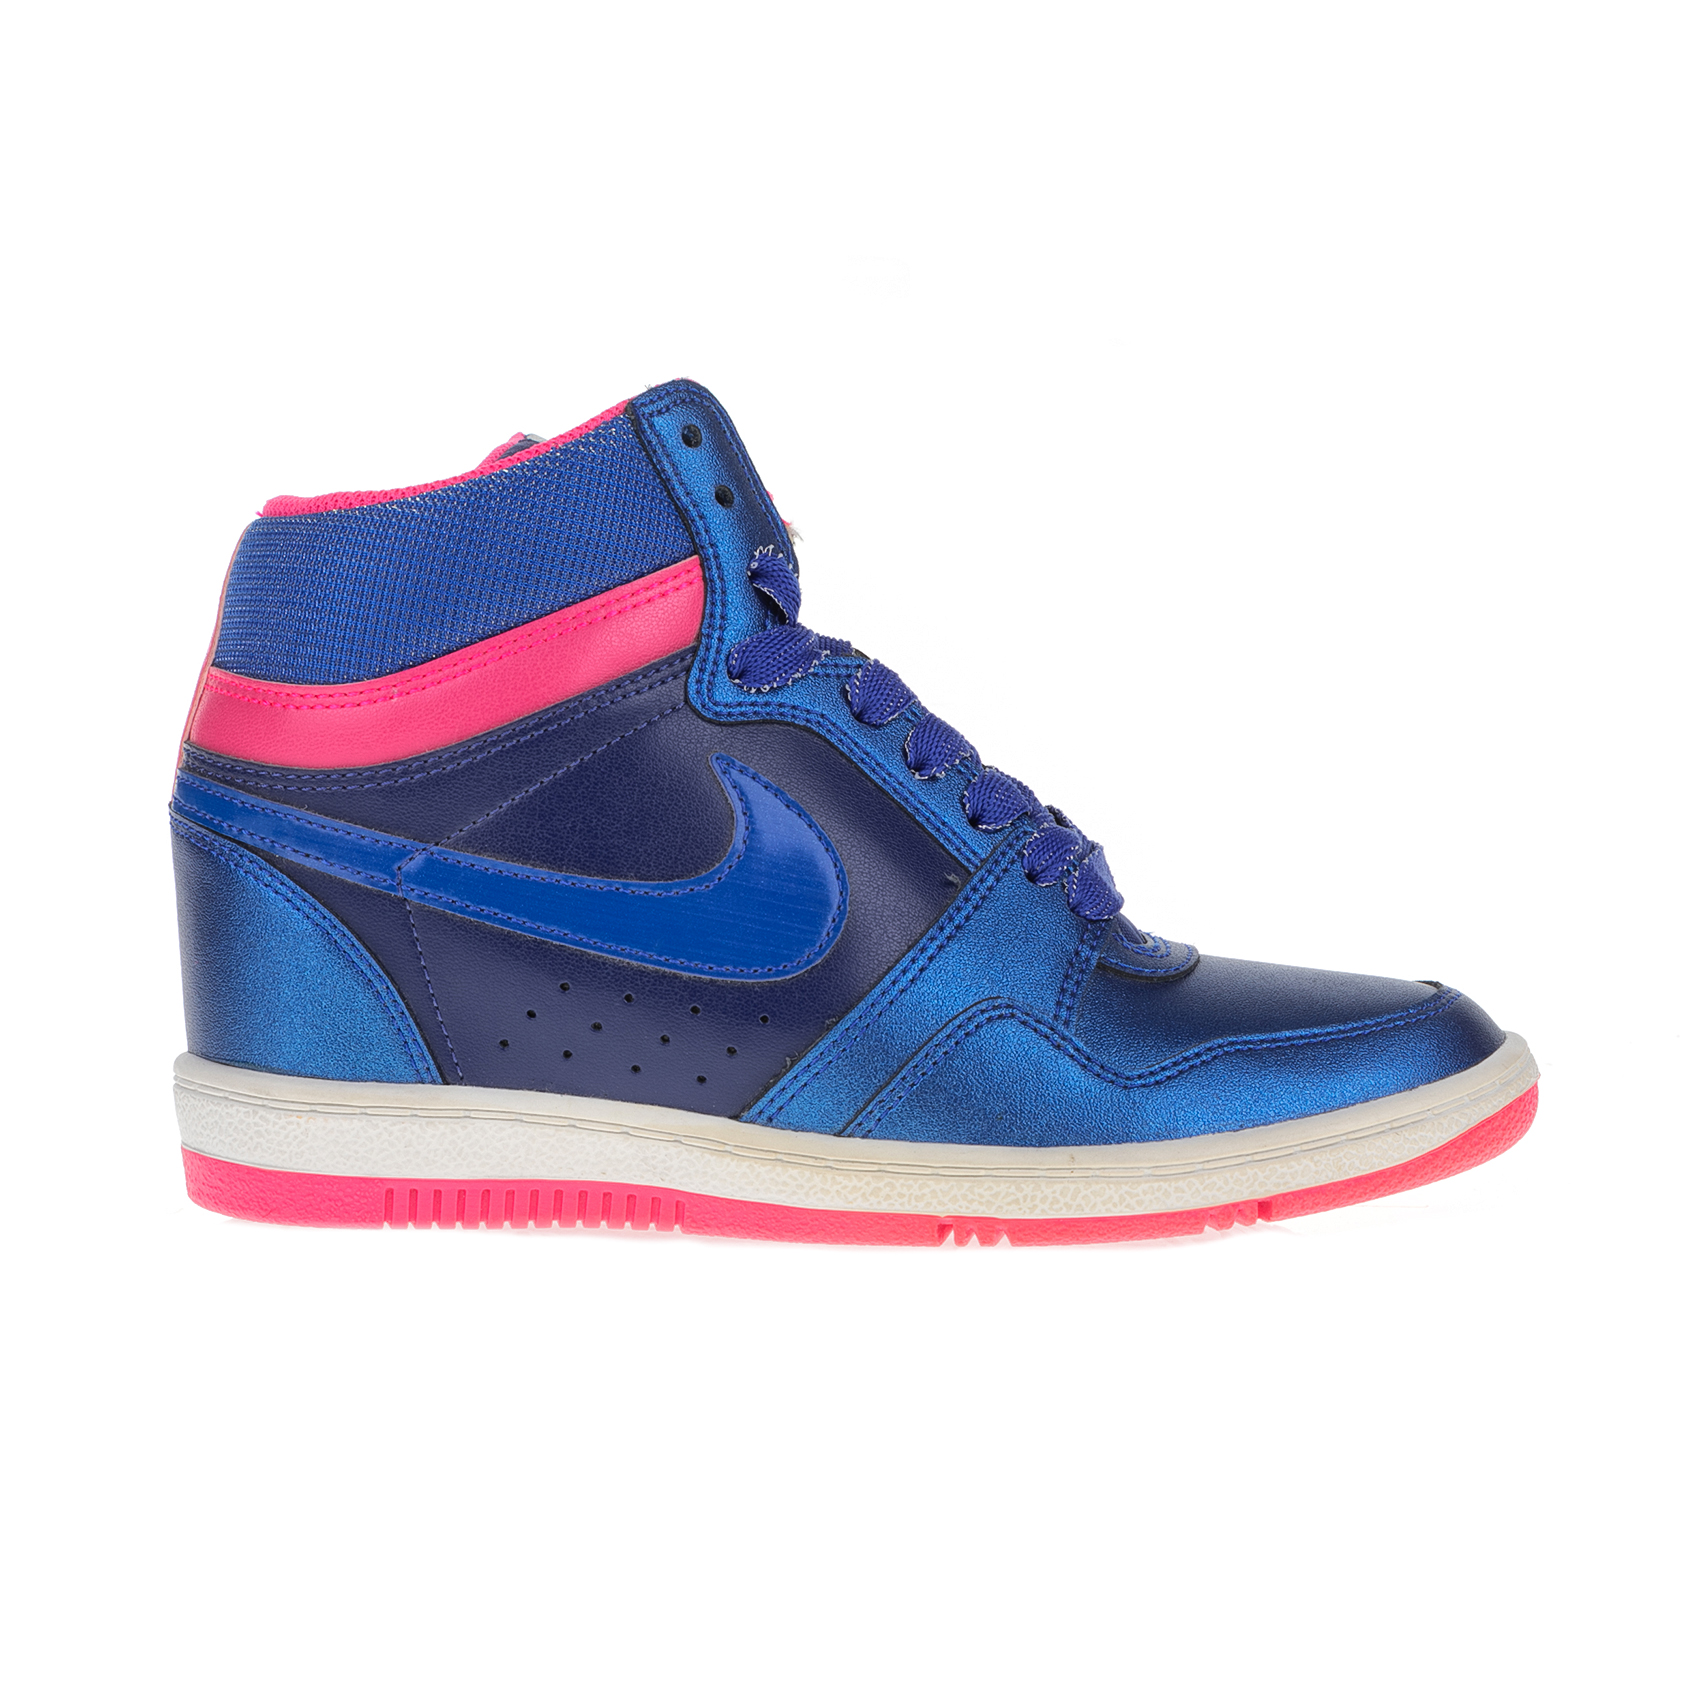 NIKE – Γυναικεία παπούτσια Nike FORCE SKY HIGH PRM μπλε